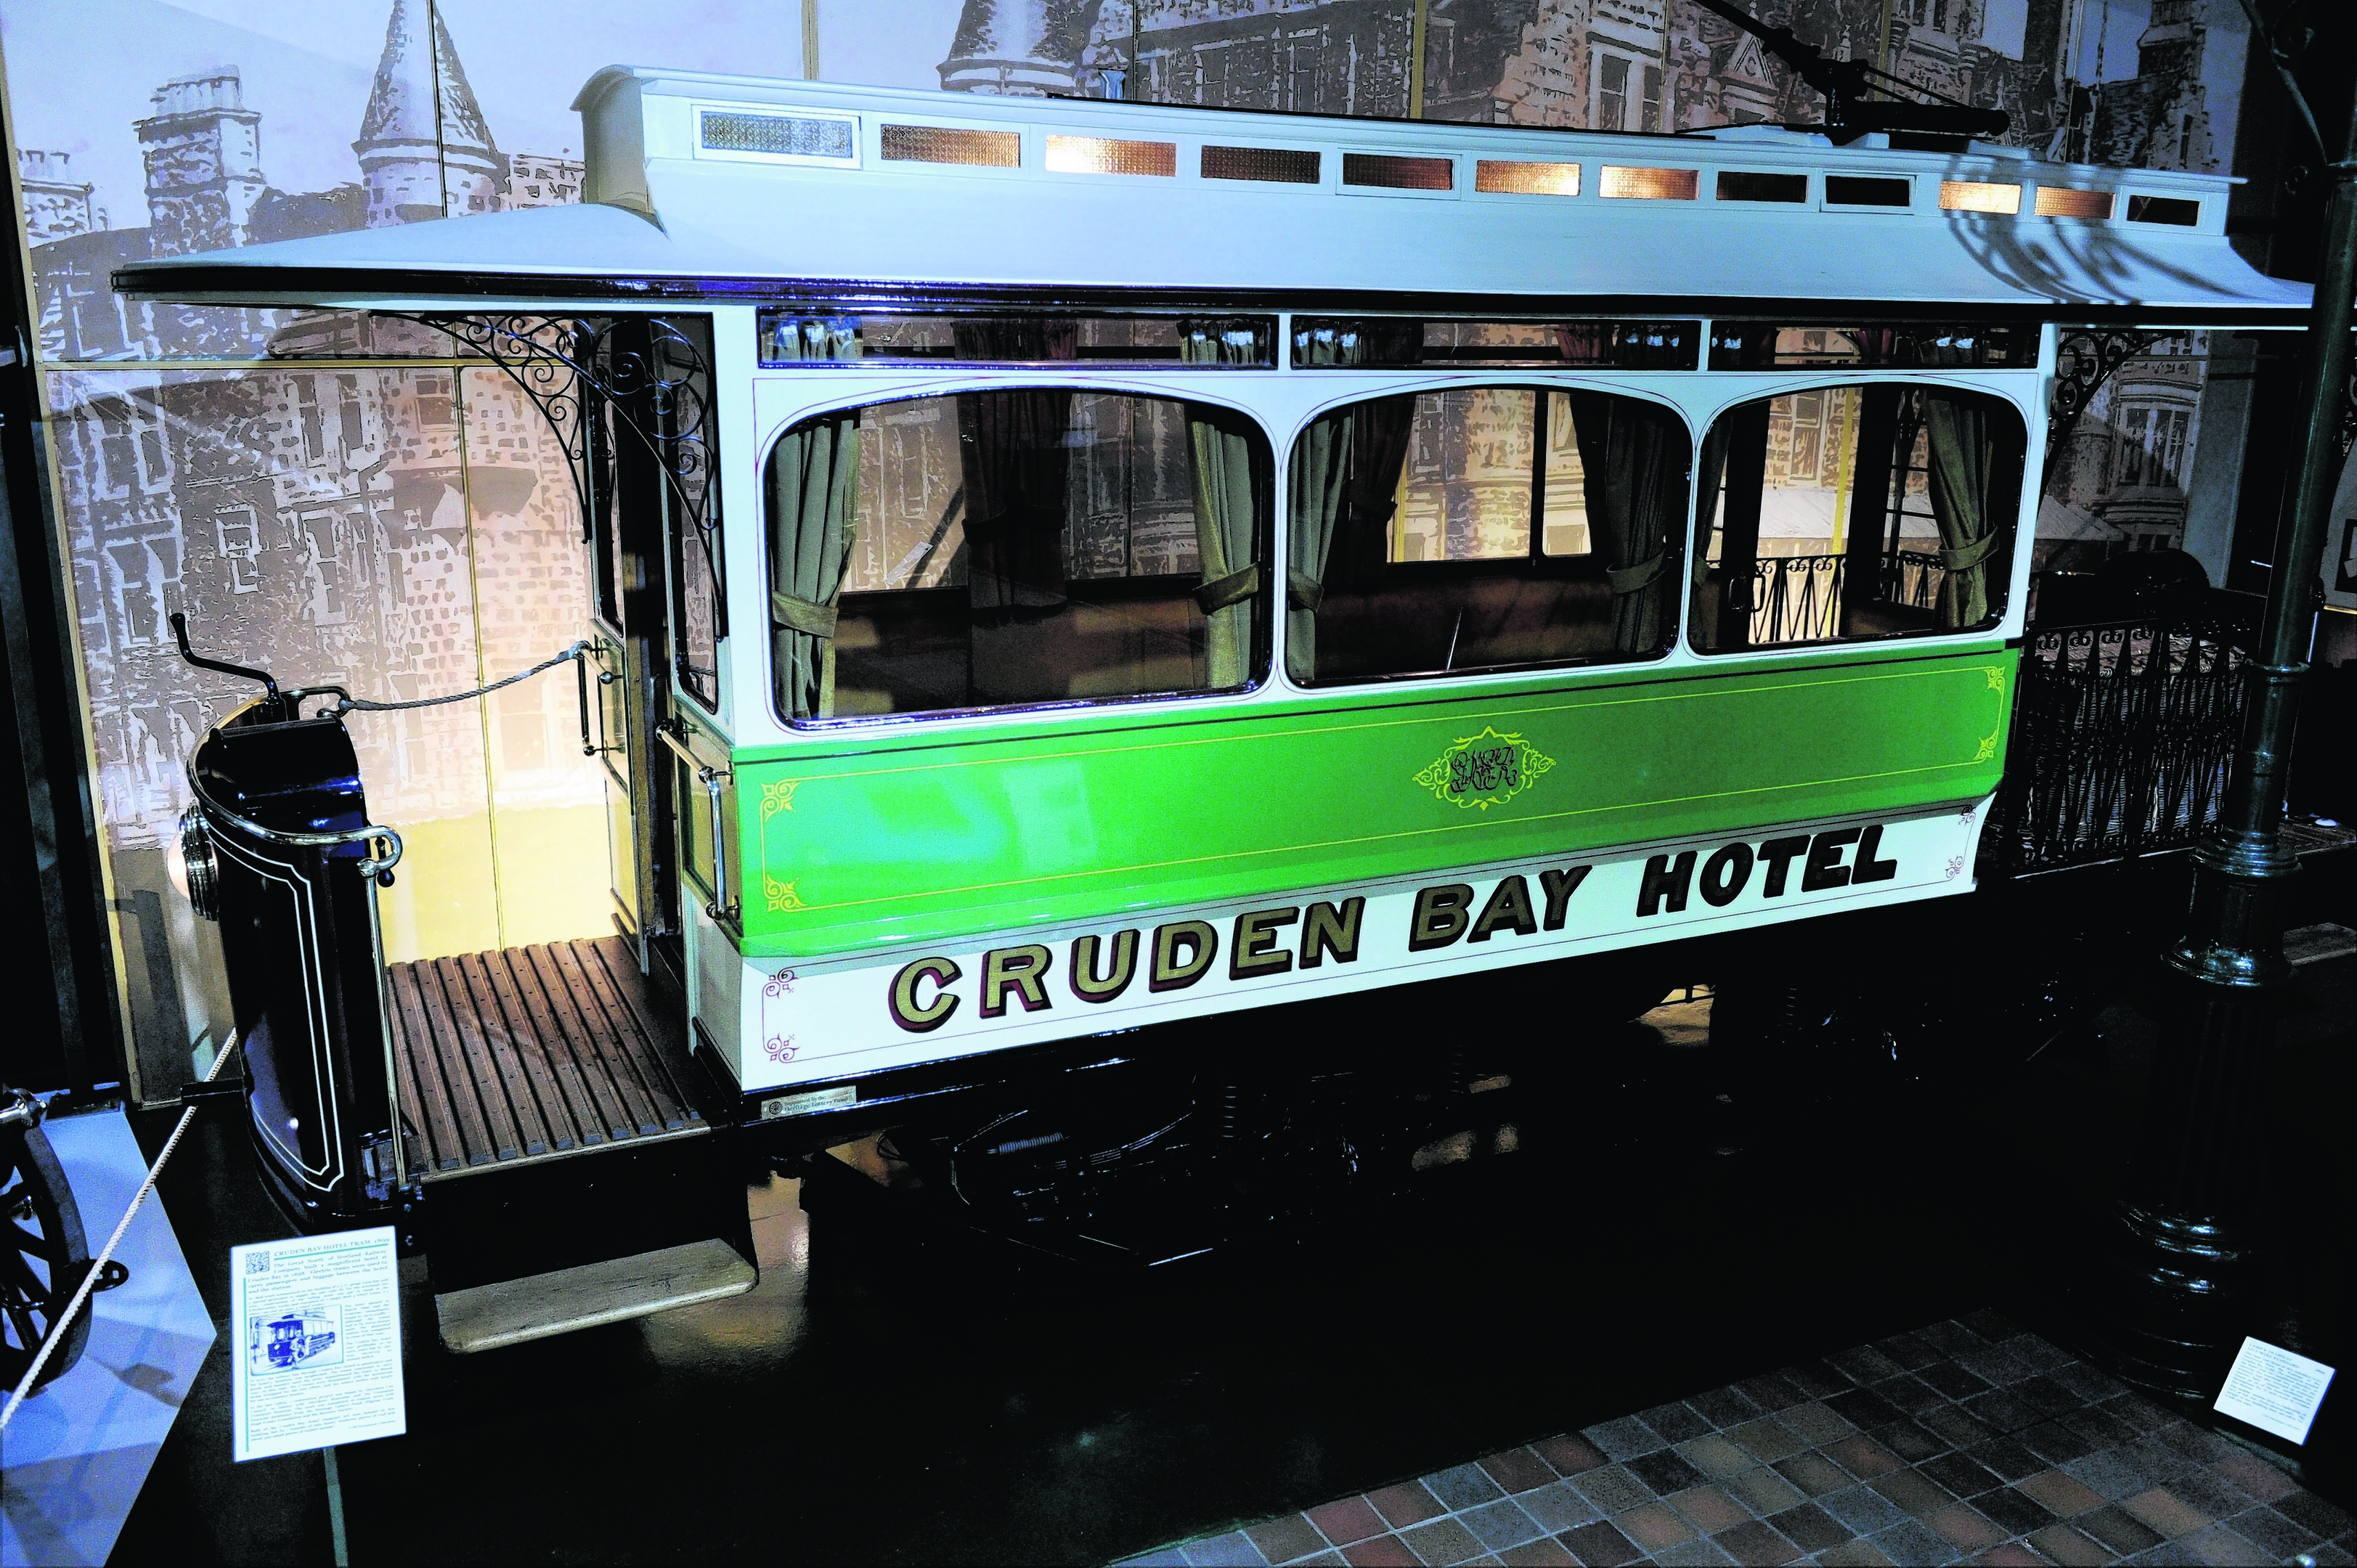 1989 Cruden Bay Hotel Tram.